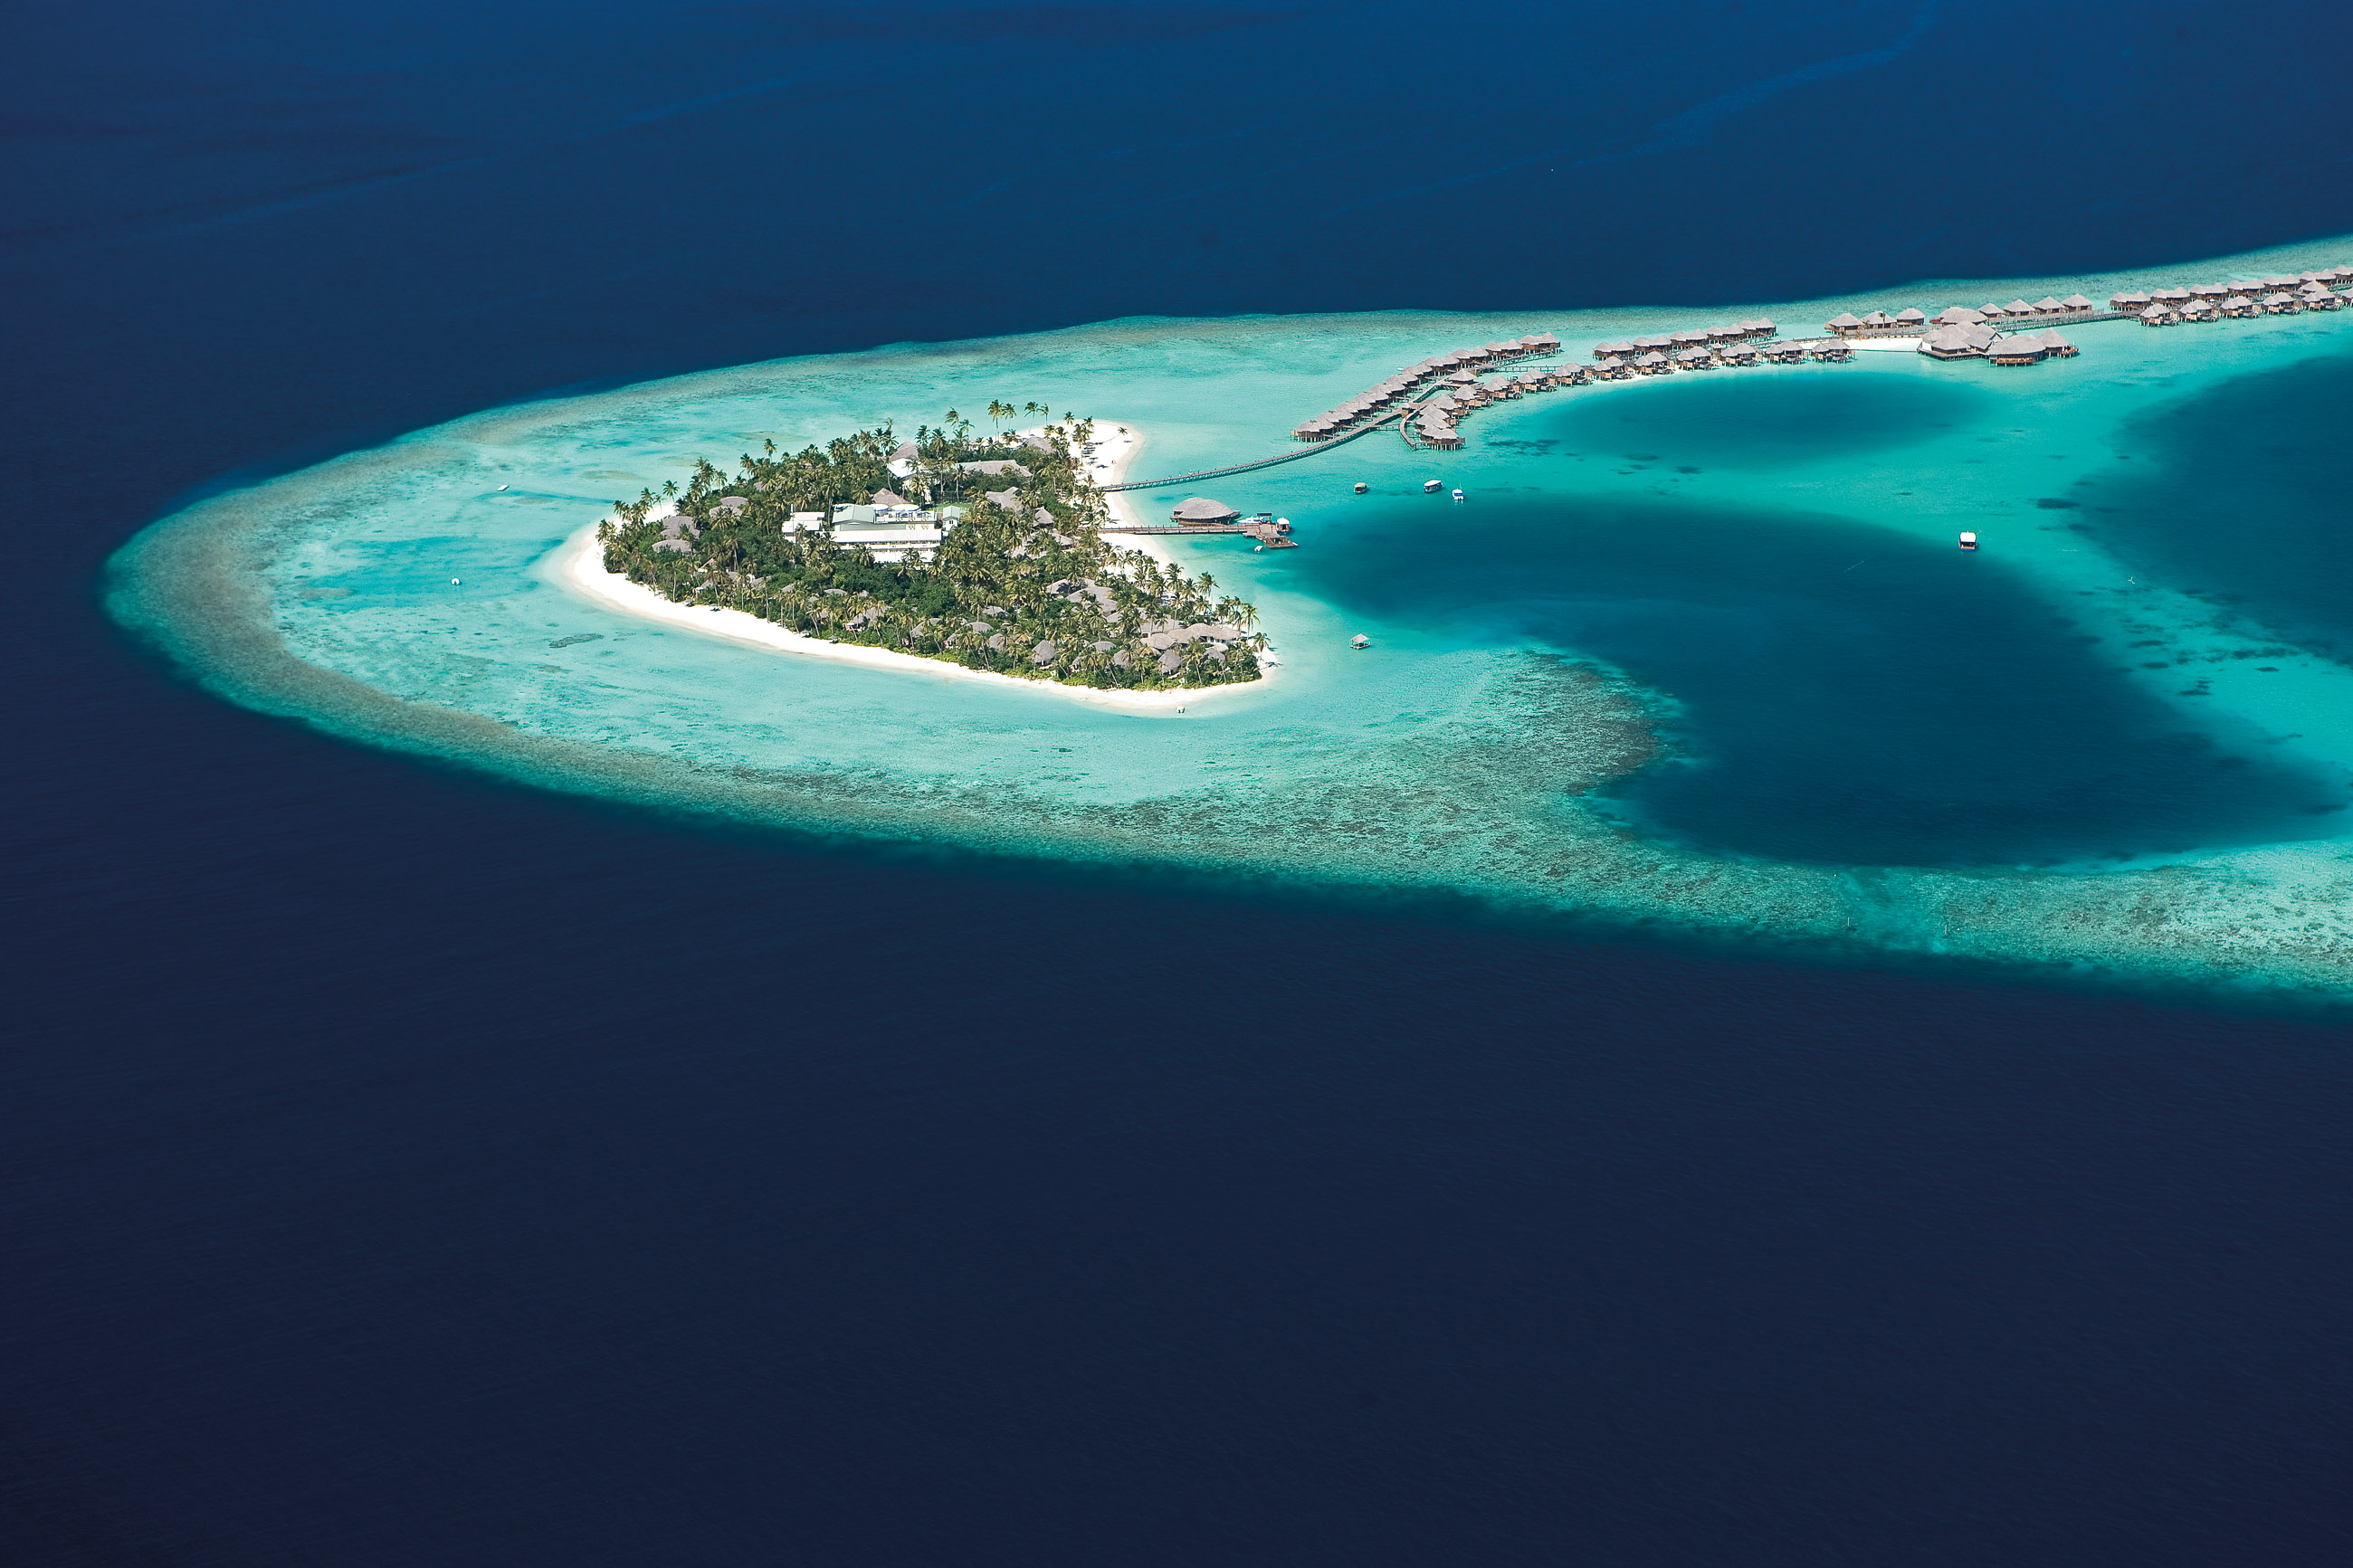 https://bubo.sk/uploads/galleries/16372/halaveli-maldives-aerial-view-3_hd-17.jpg